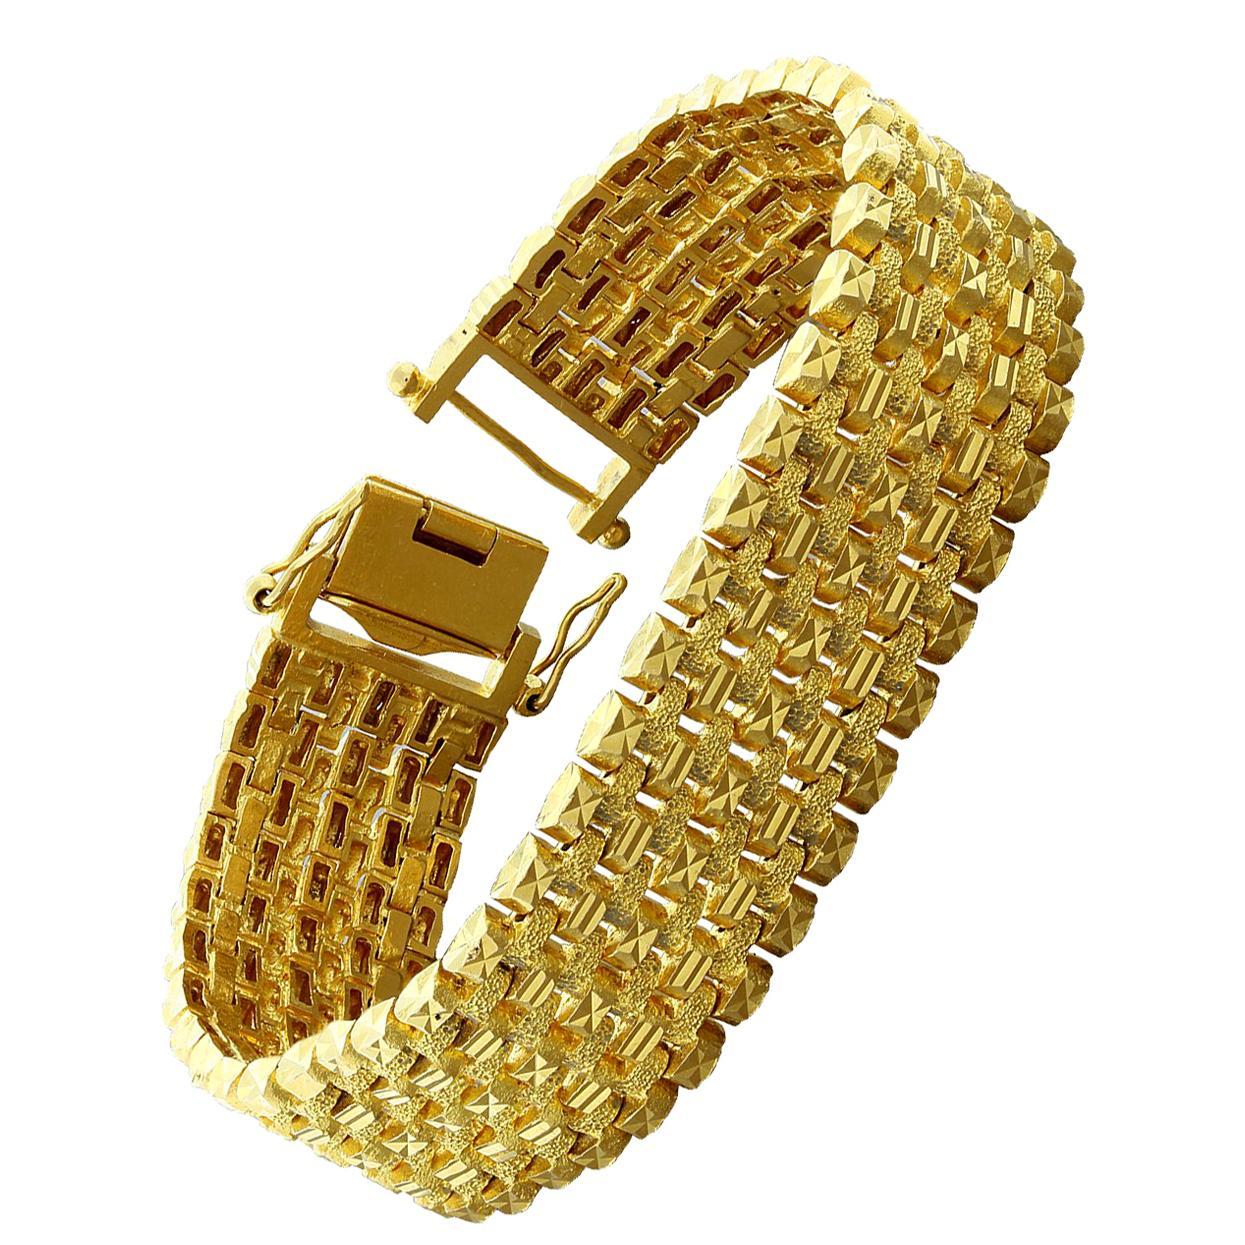 eb8a0517d8d1c Iranian Two-Tone Textured Gold Bracelet